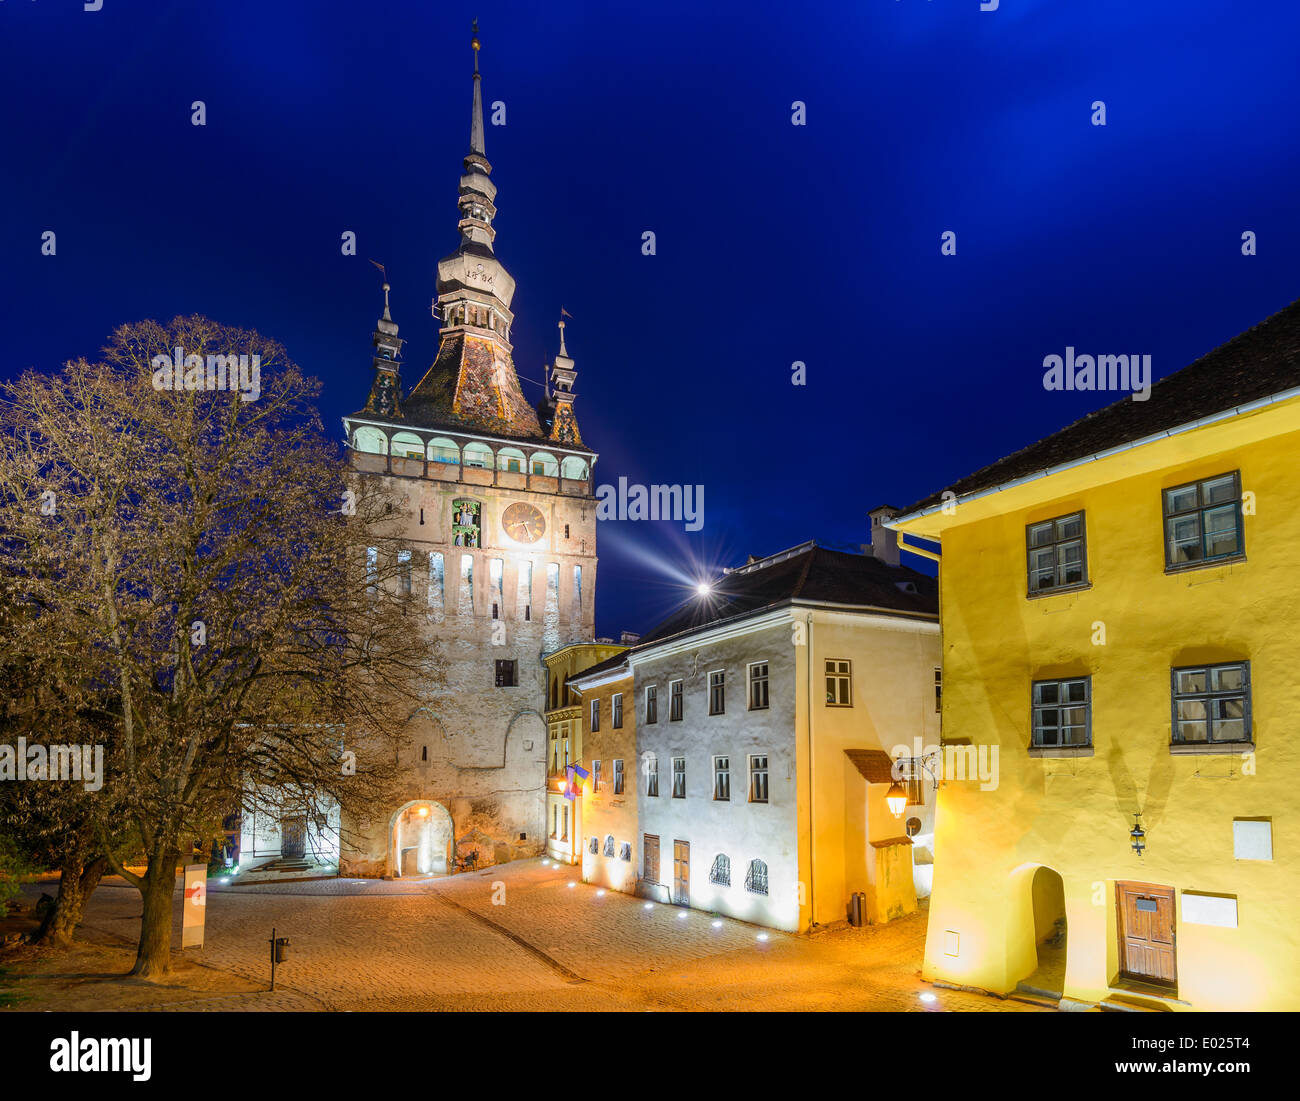 clock tower in sighisoara, transylvania, romania, at night Stock Photo